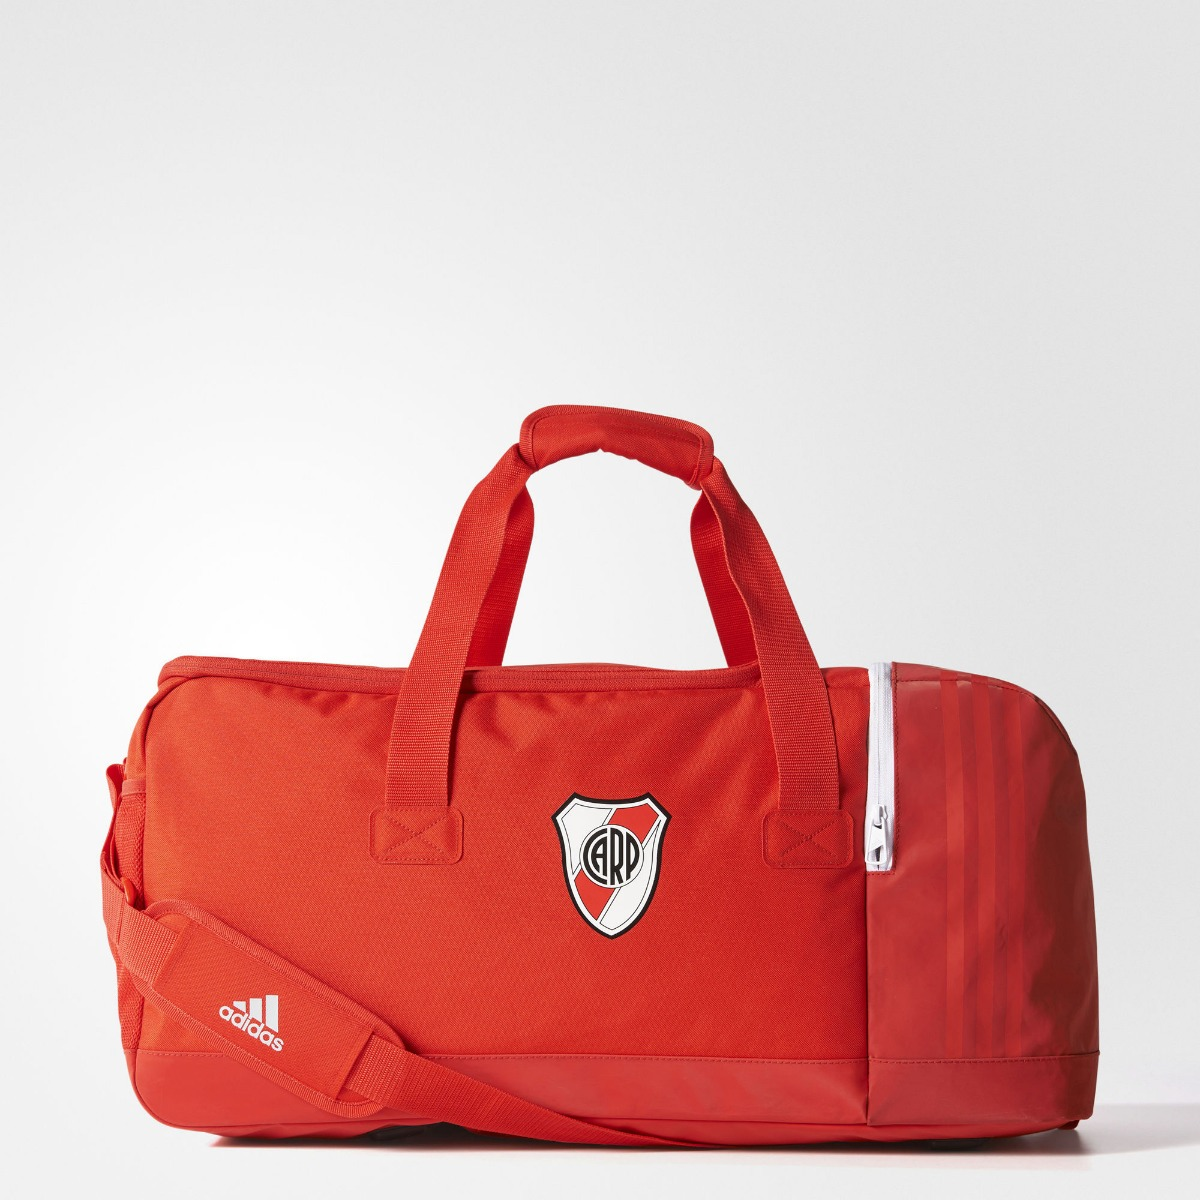 a6d47a8f0 Bolso adidas River Plate Medium Futbol 2018 - $ 1.700,00 en Mercado ...